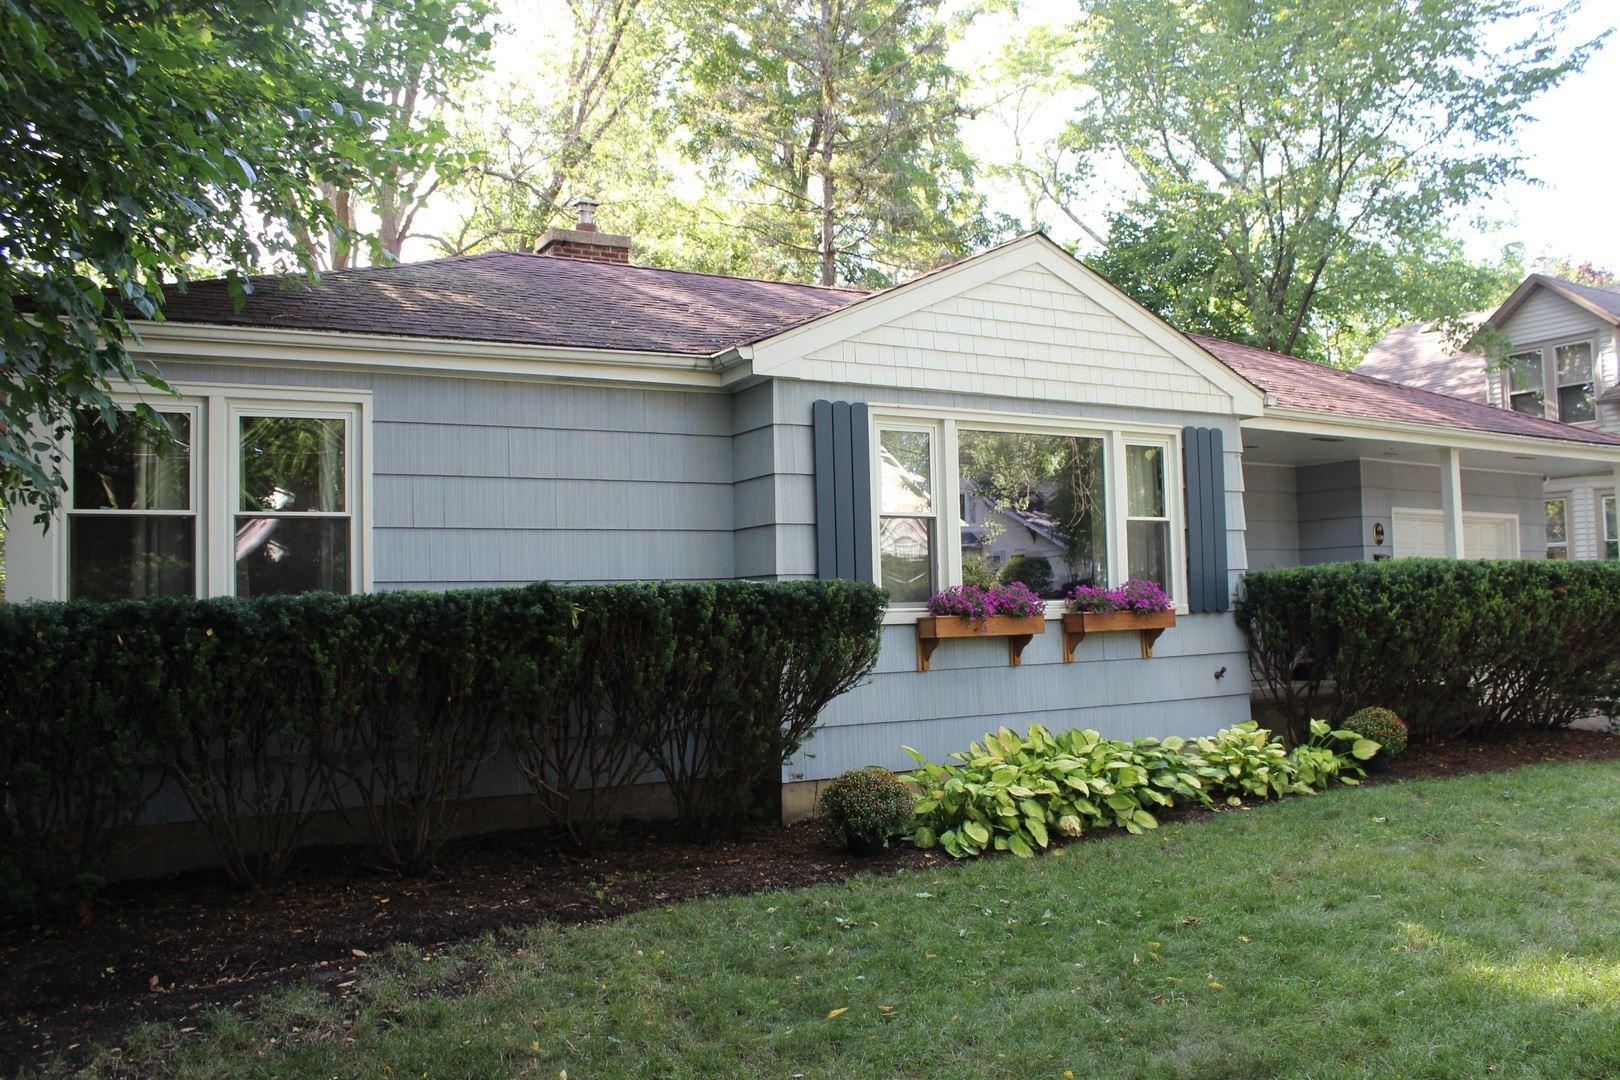 650 Chestnut Street, Deerfield, IL 60015 - #: 10815491